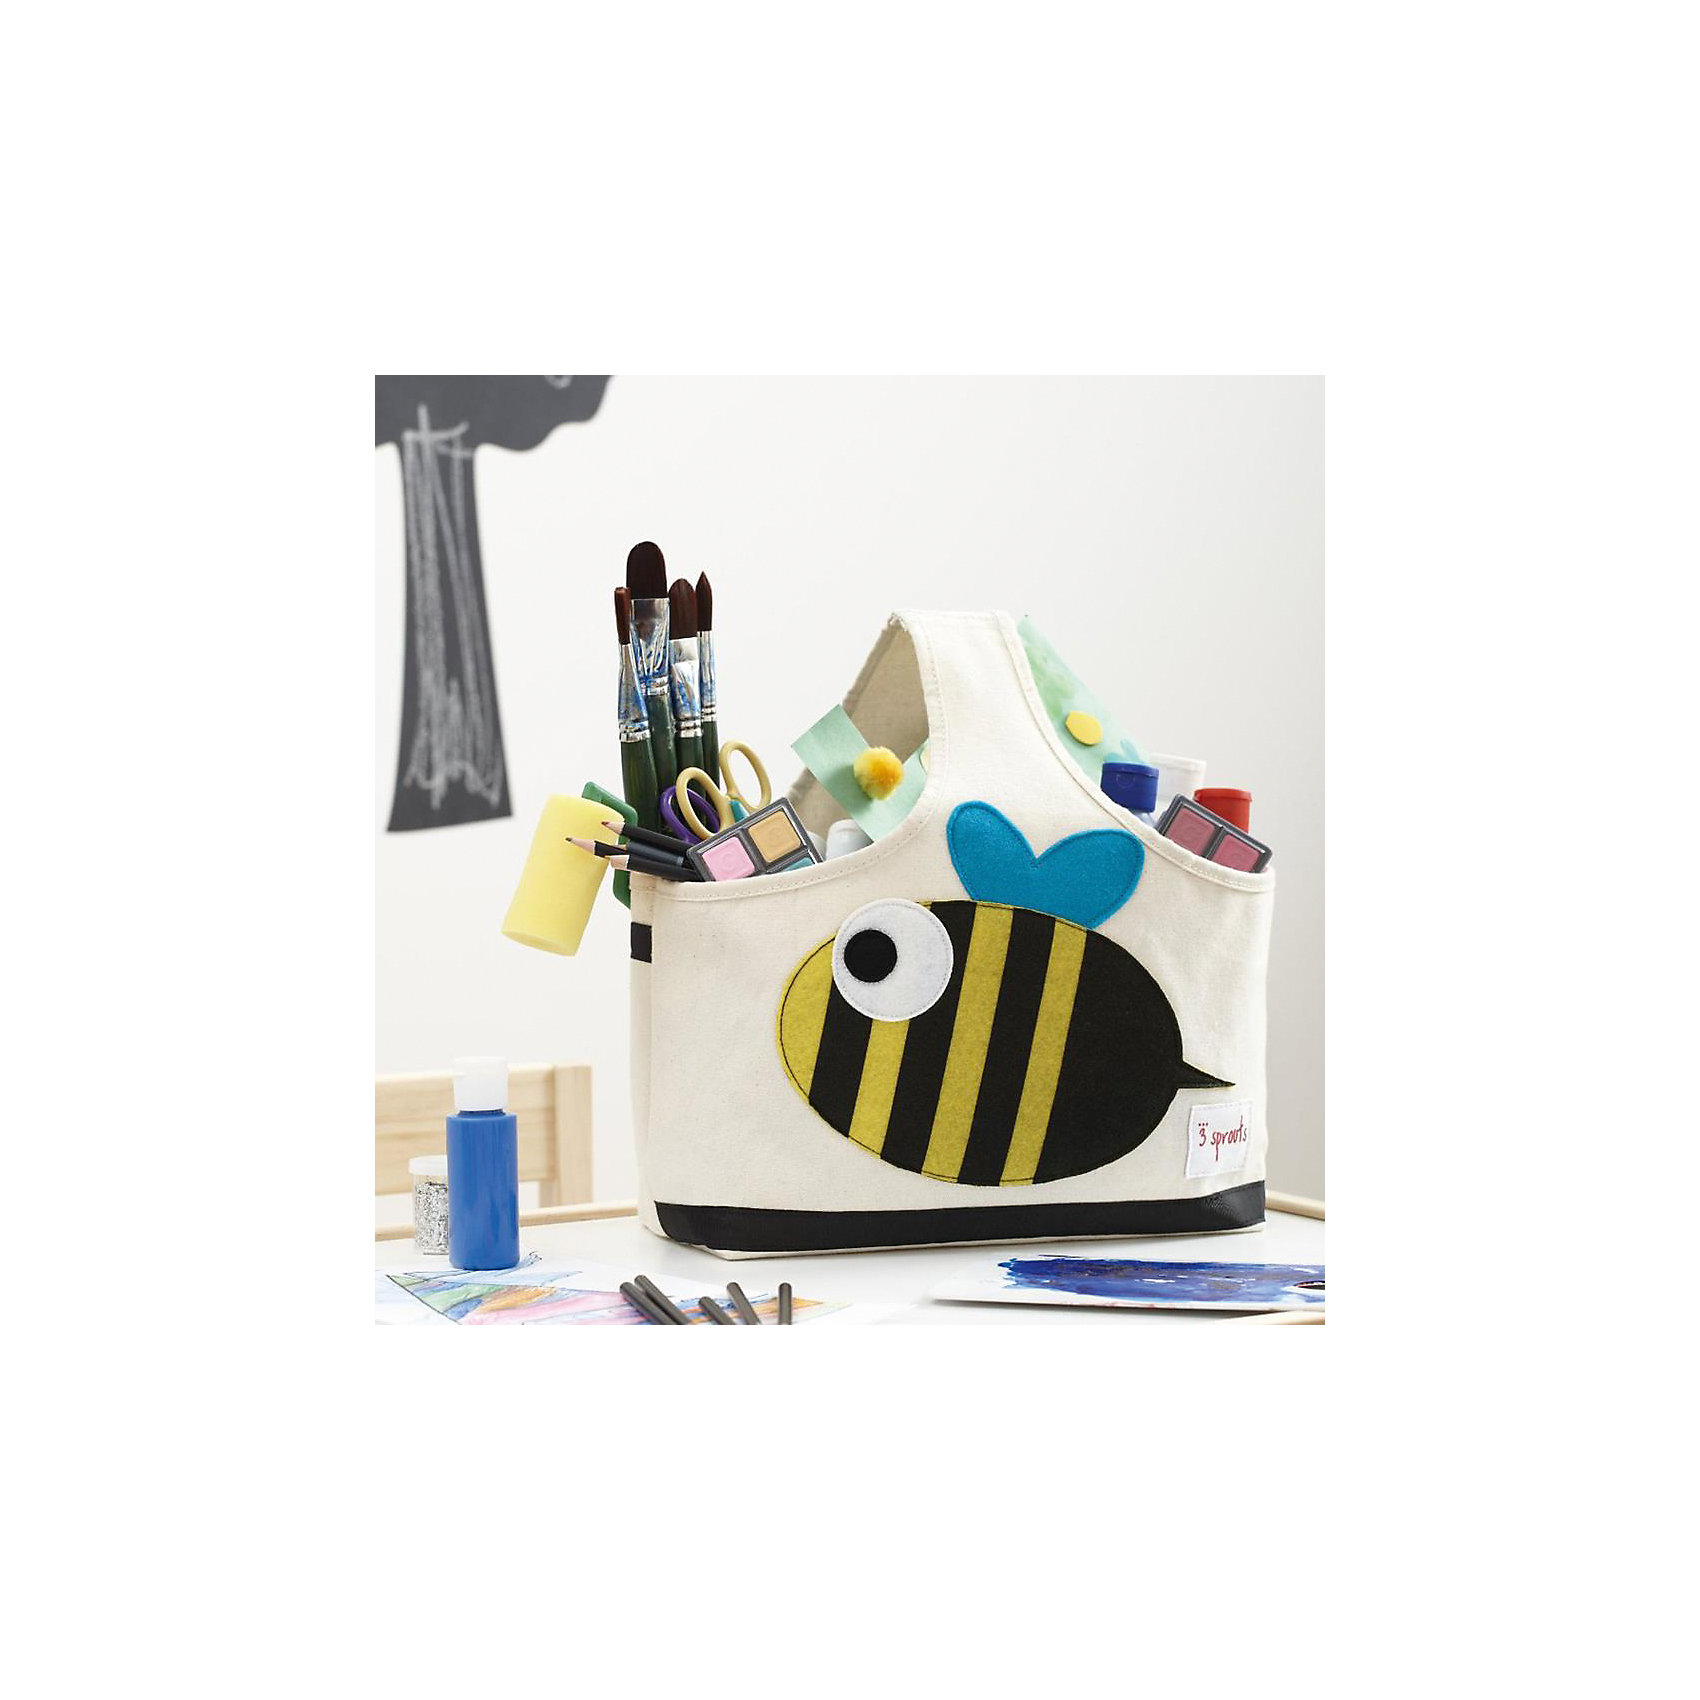 Сумочка для хранения детских принадлежностей Морж (Blue Walrus), 3 Sprouts от myToys